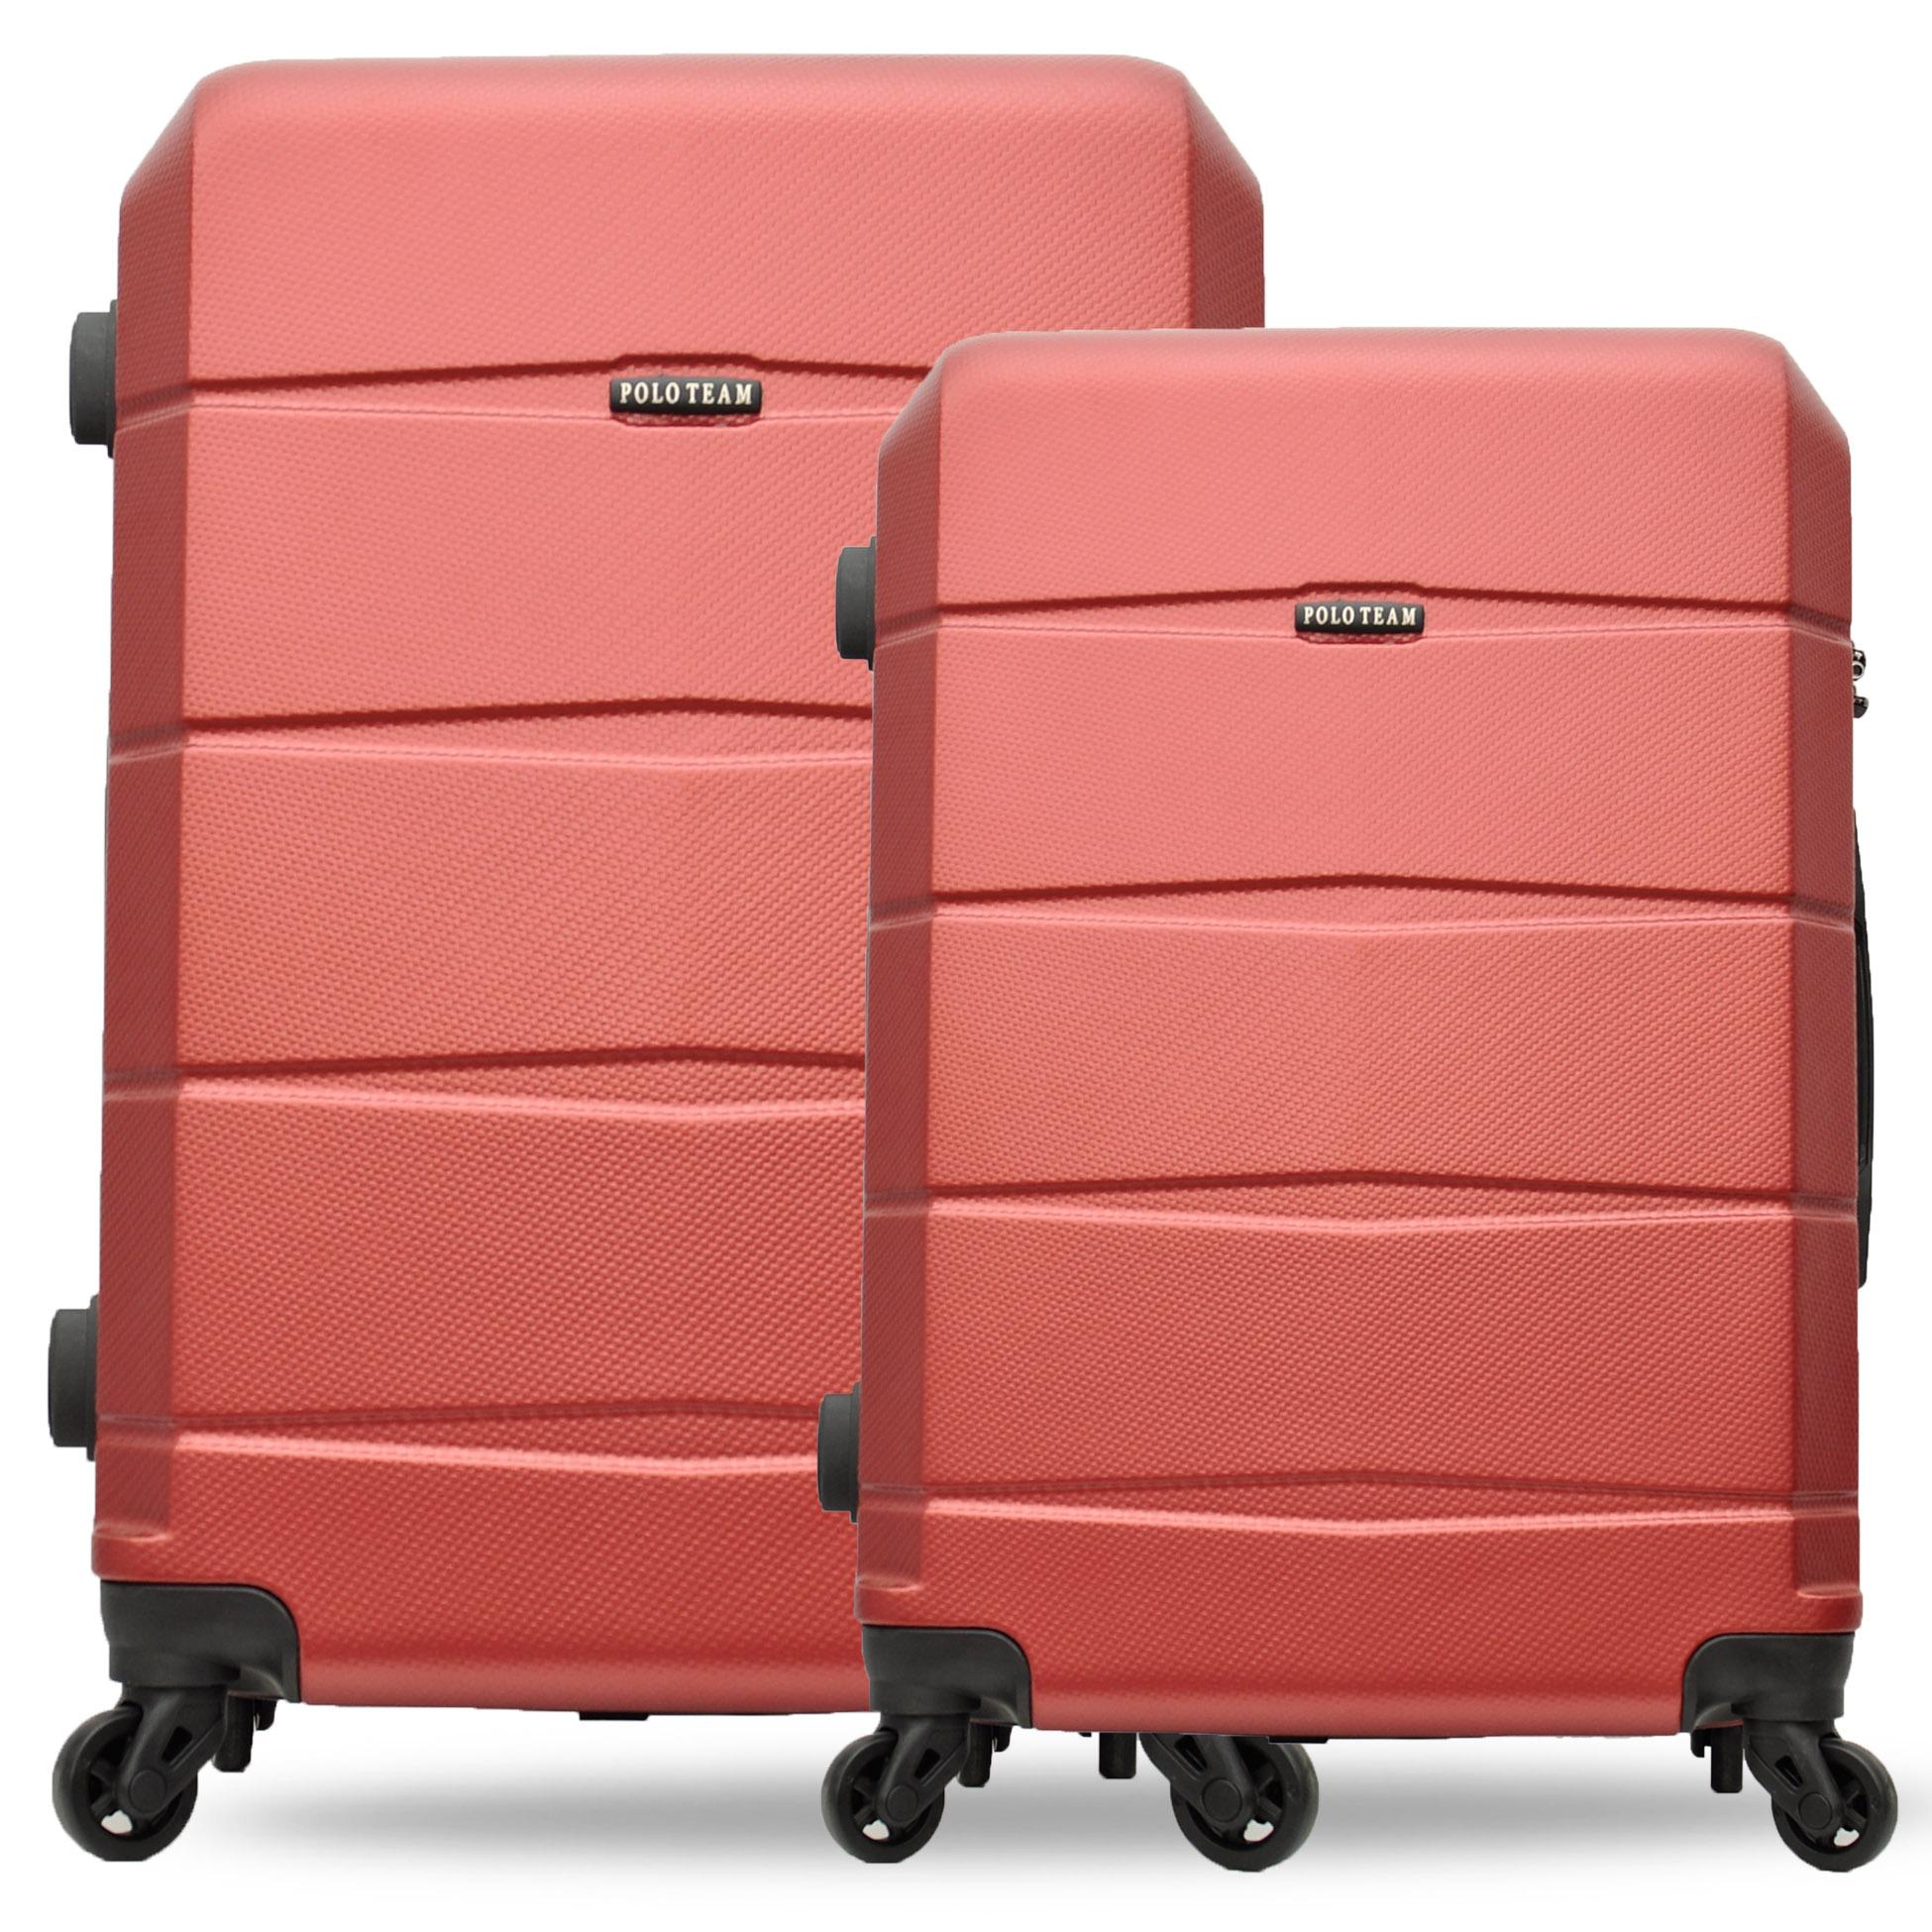 Polo Team Tas Koper Hardcase SET size 20+24 inch - 301 32fe6e9208